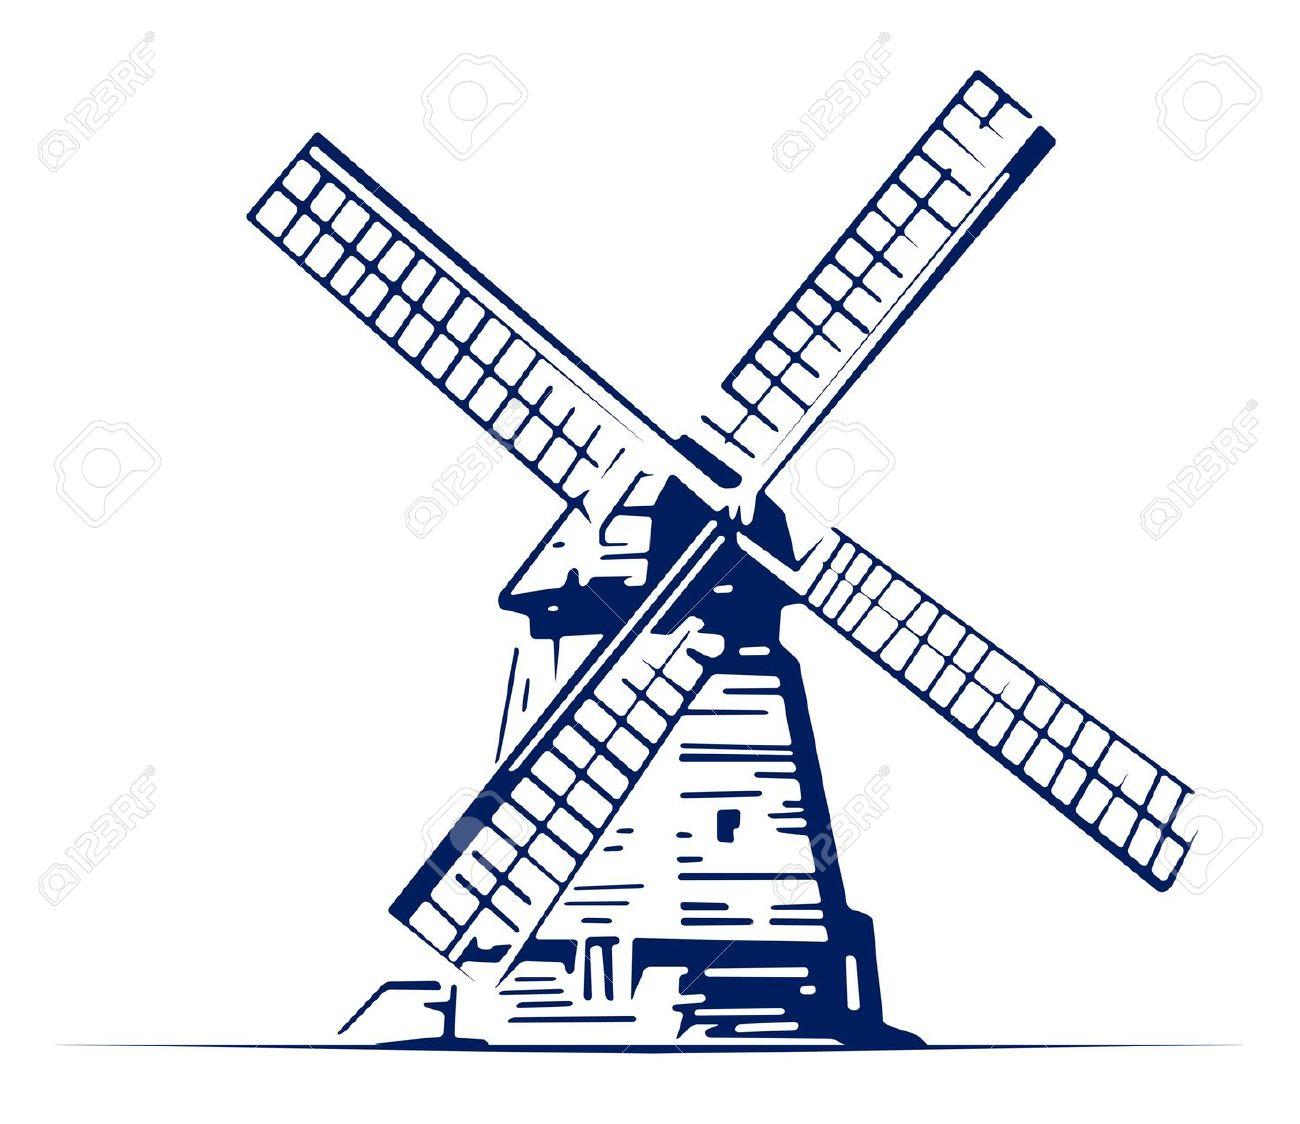 Mill Emblem Royalty Free Cliparts, Vectors, And Stock Illustration.